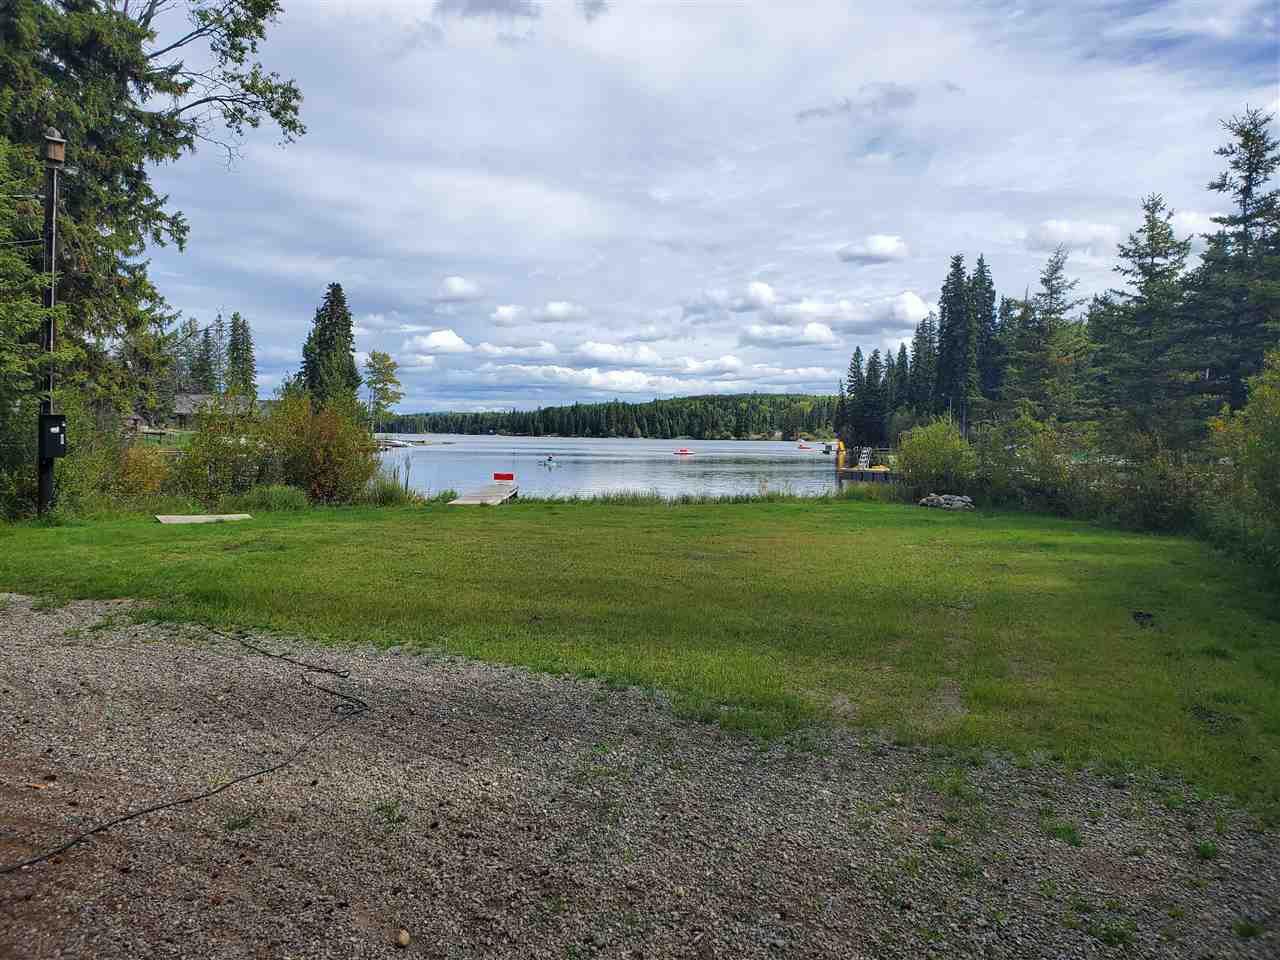 Main Photo: 7271 NATH Road in Bridge Lake: Bridge Lake/Sheridan Lake Land for sale (100 Mile House (Zone 10))  : MLS®# R2496086